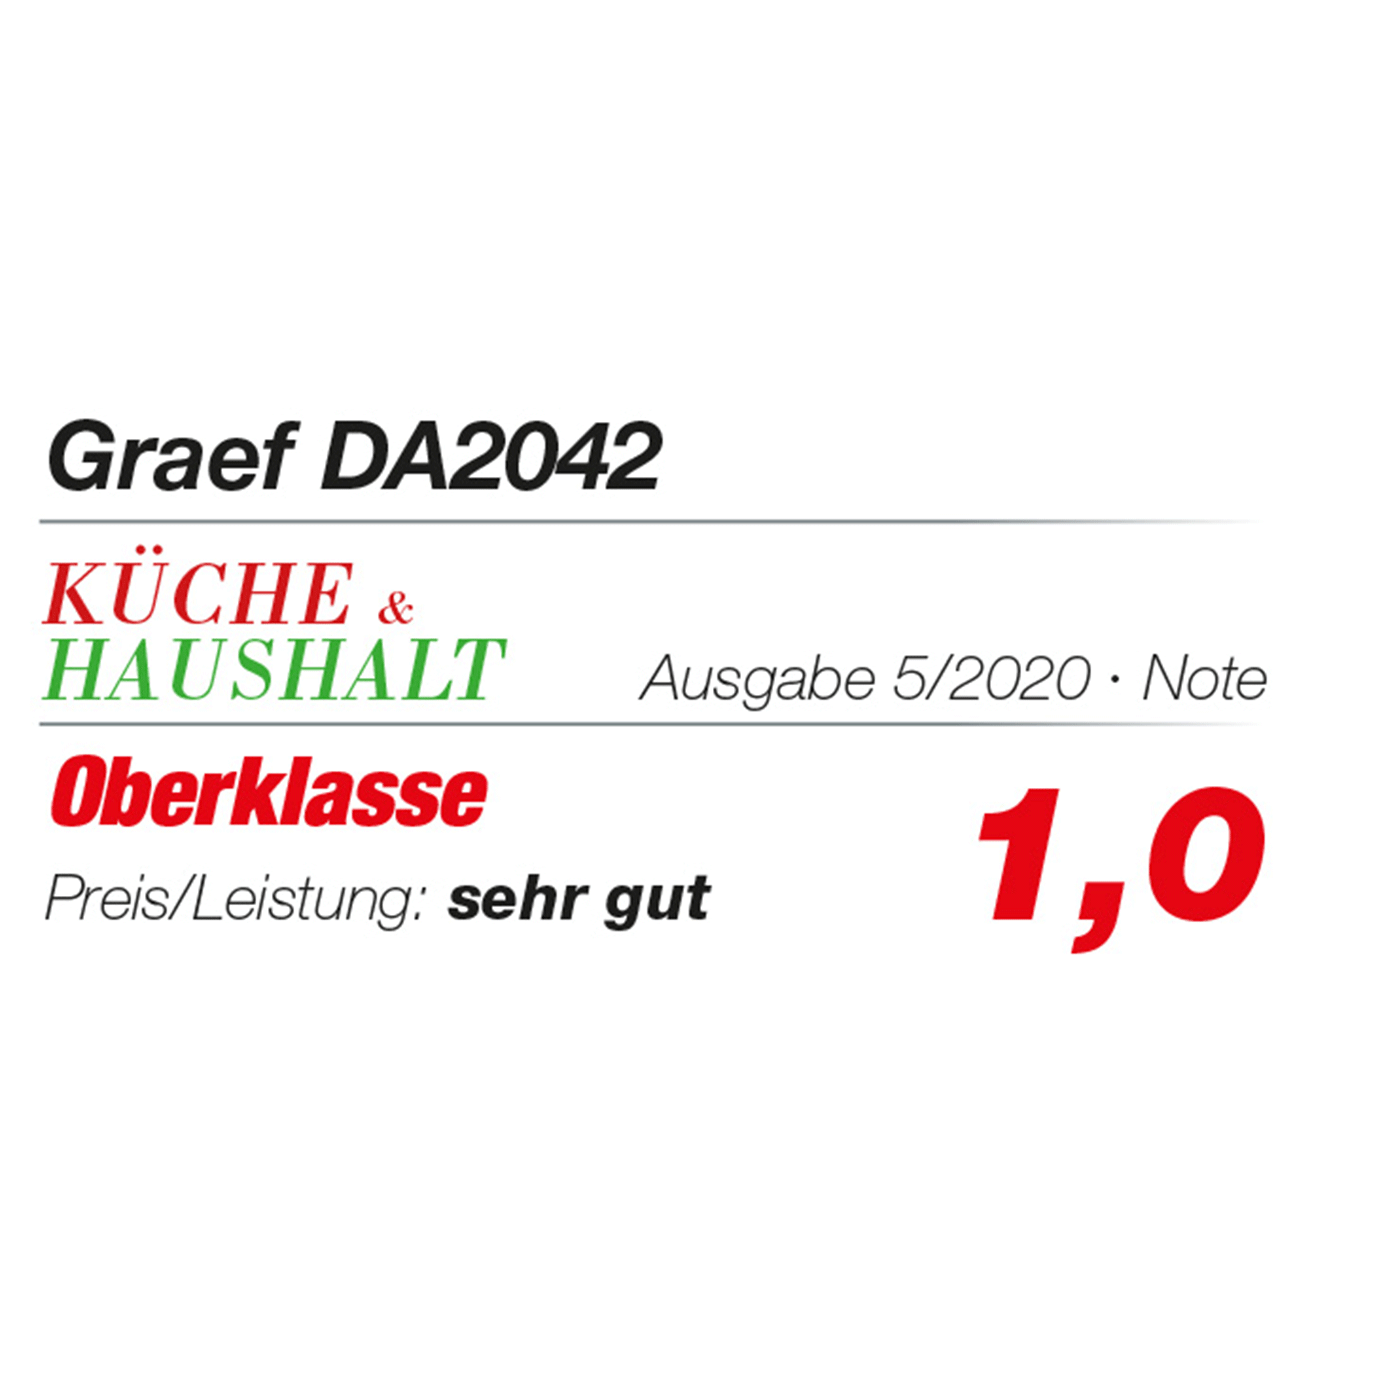 Graef Mini-Dörrautomat DA2042EU - Kueche&Haushalt_05-2020_Testlogo